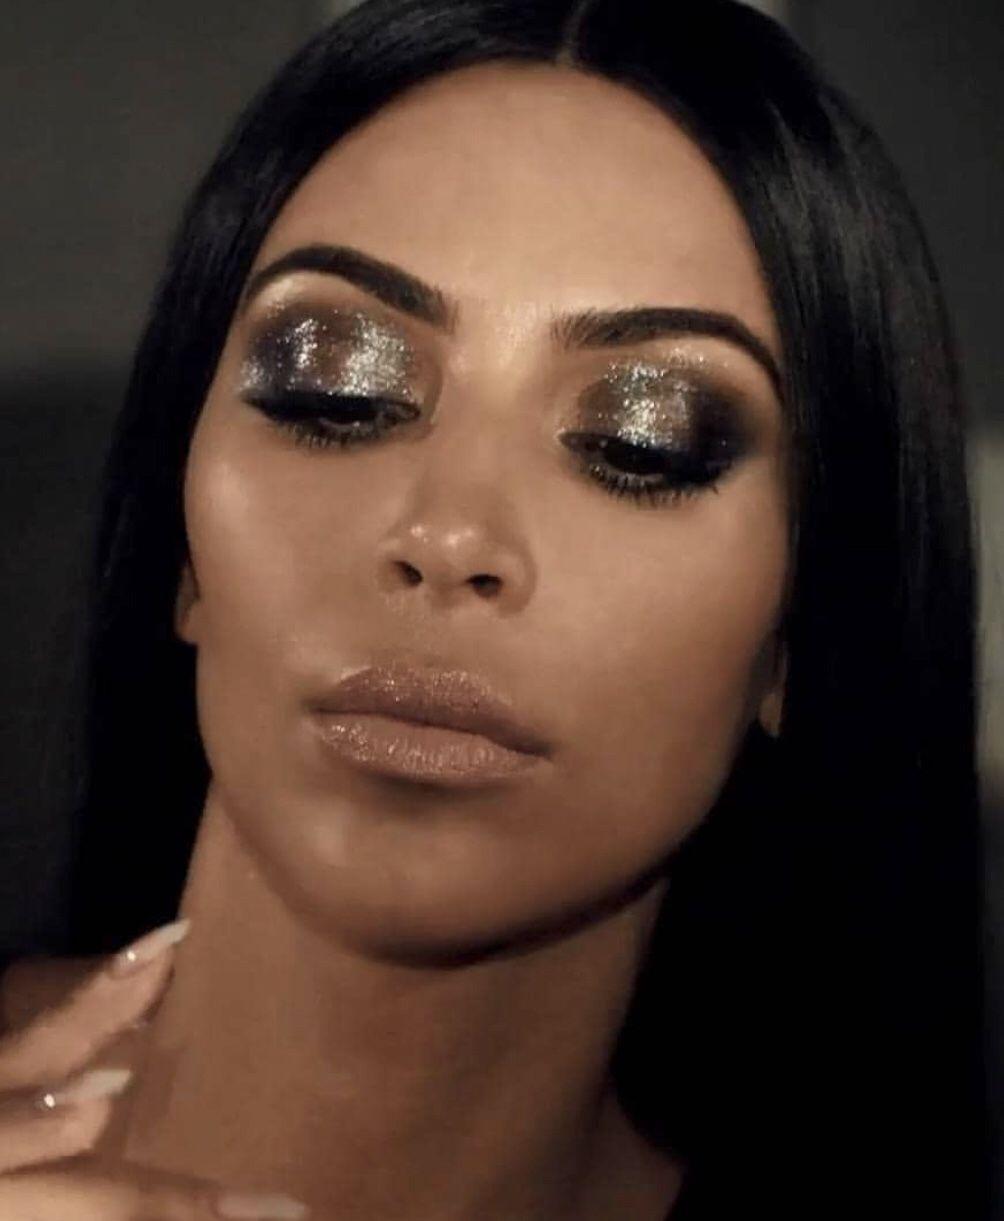 Lily rose cameron see through,Aubrey Plaza nude. 2018-2019 celebrityes photos leaks! XXX tube Usatame misc,Kylie minogue legs